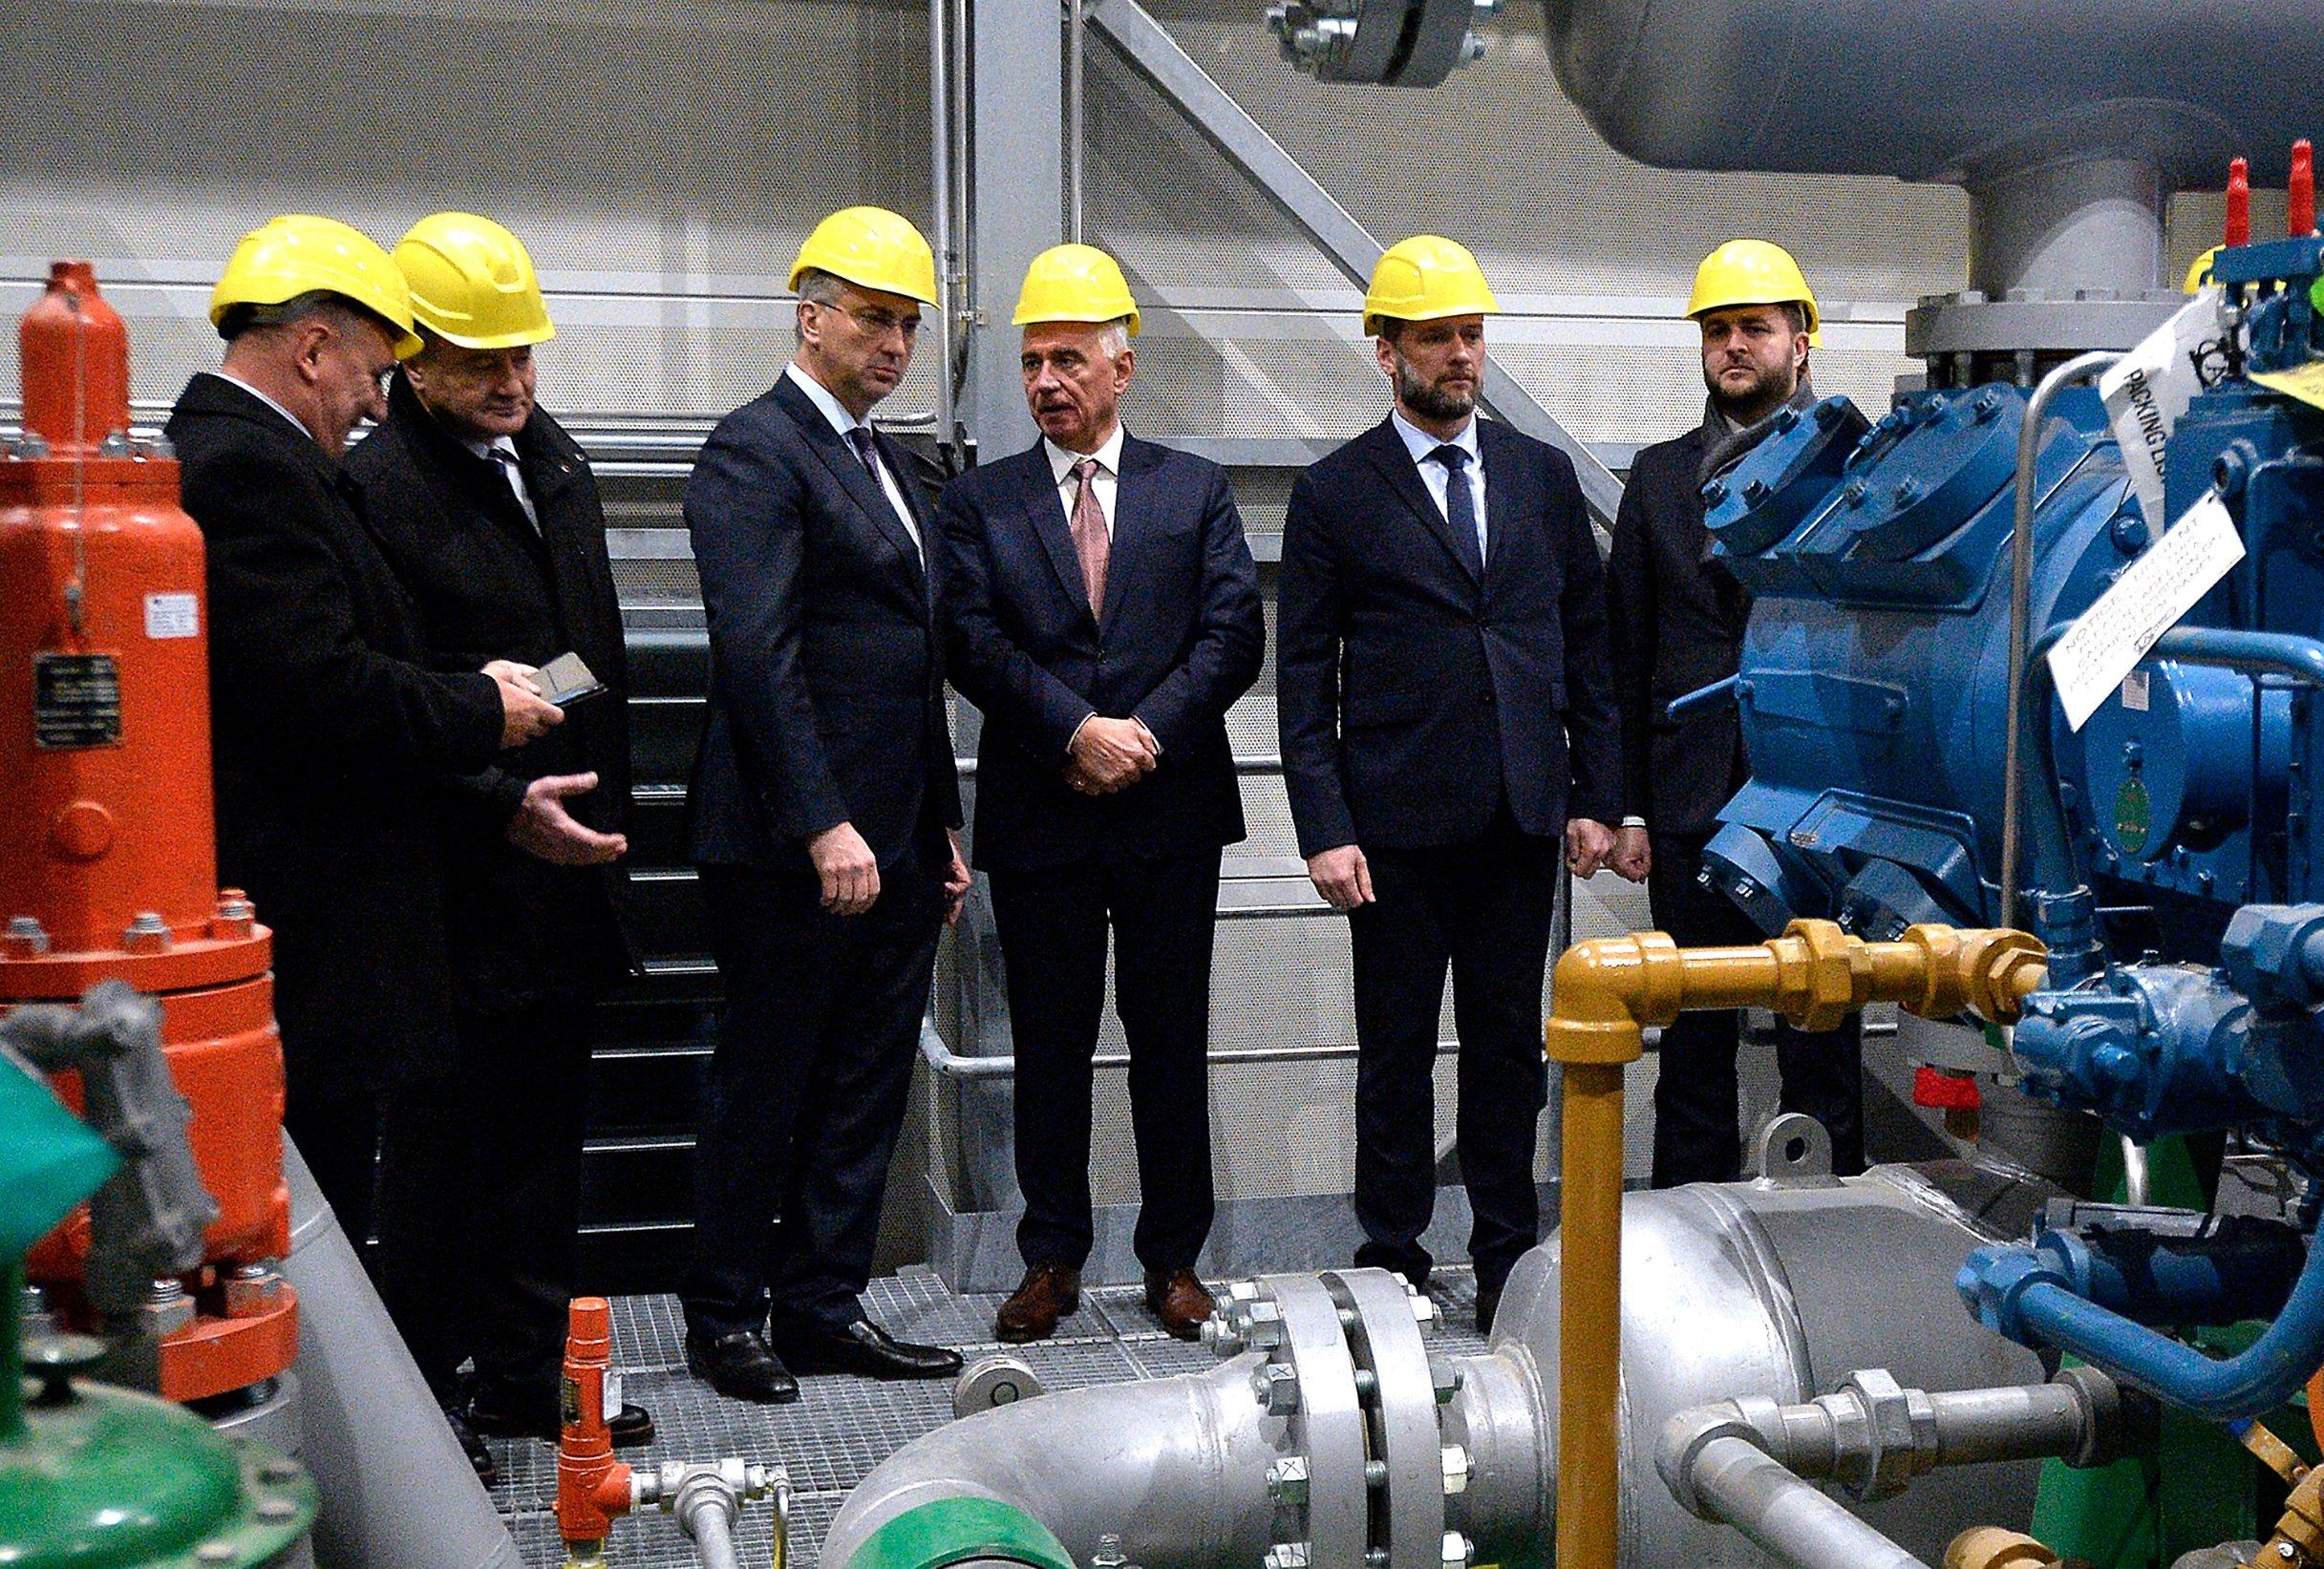 Andrej Plenković na svečanom otvaranju prve kompresorske stanice na plinskom transportnom sustavu